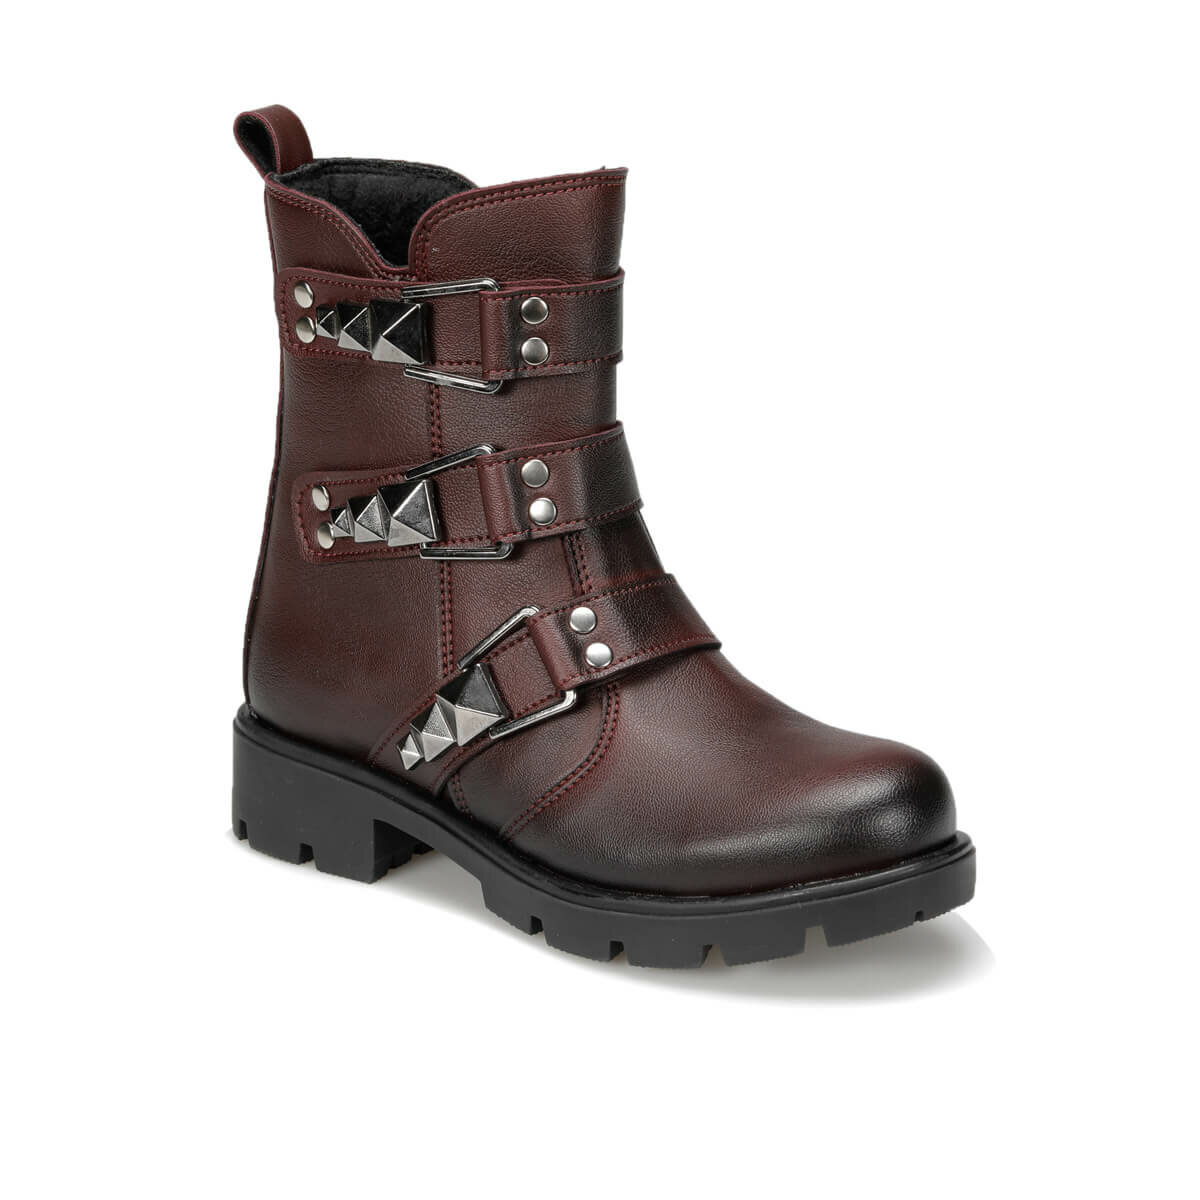 FLO 92. DUKE-2.F Burgundy Female Child Boots PINKSTEP